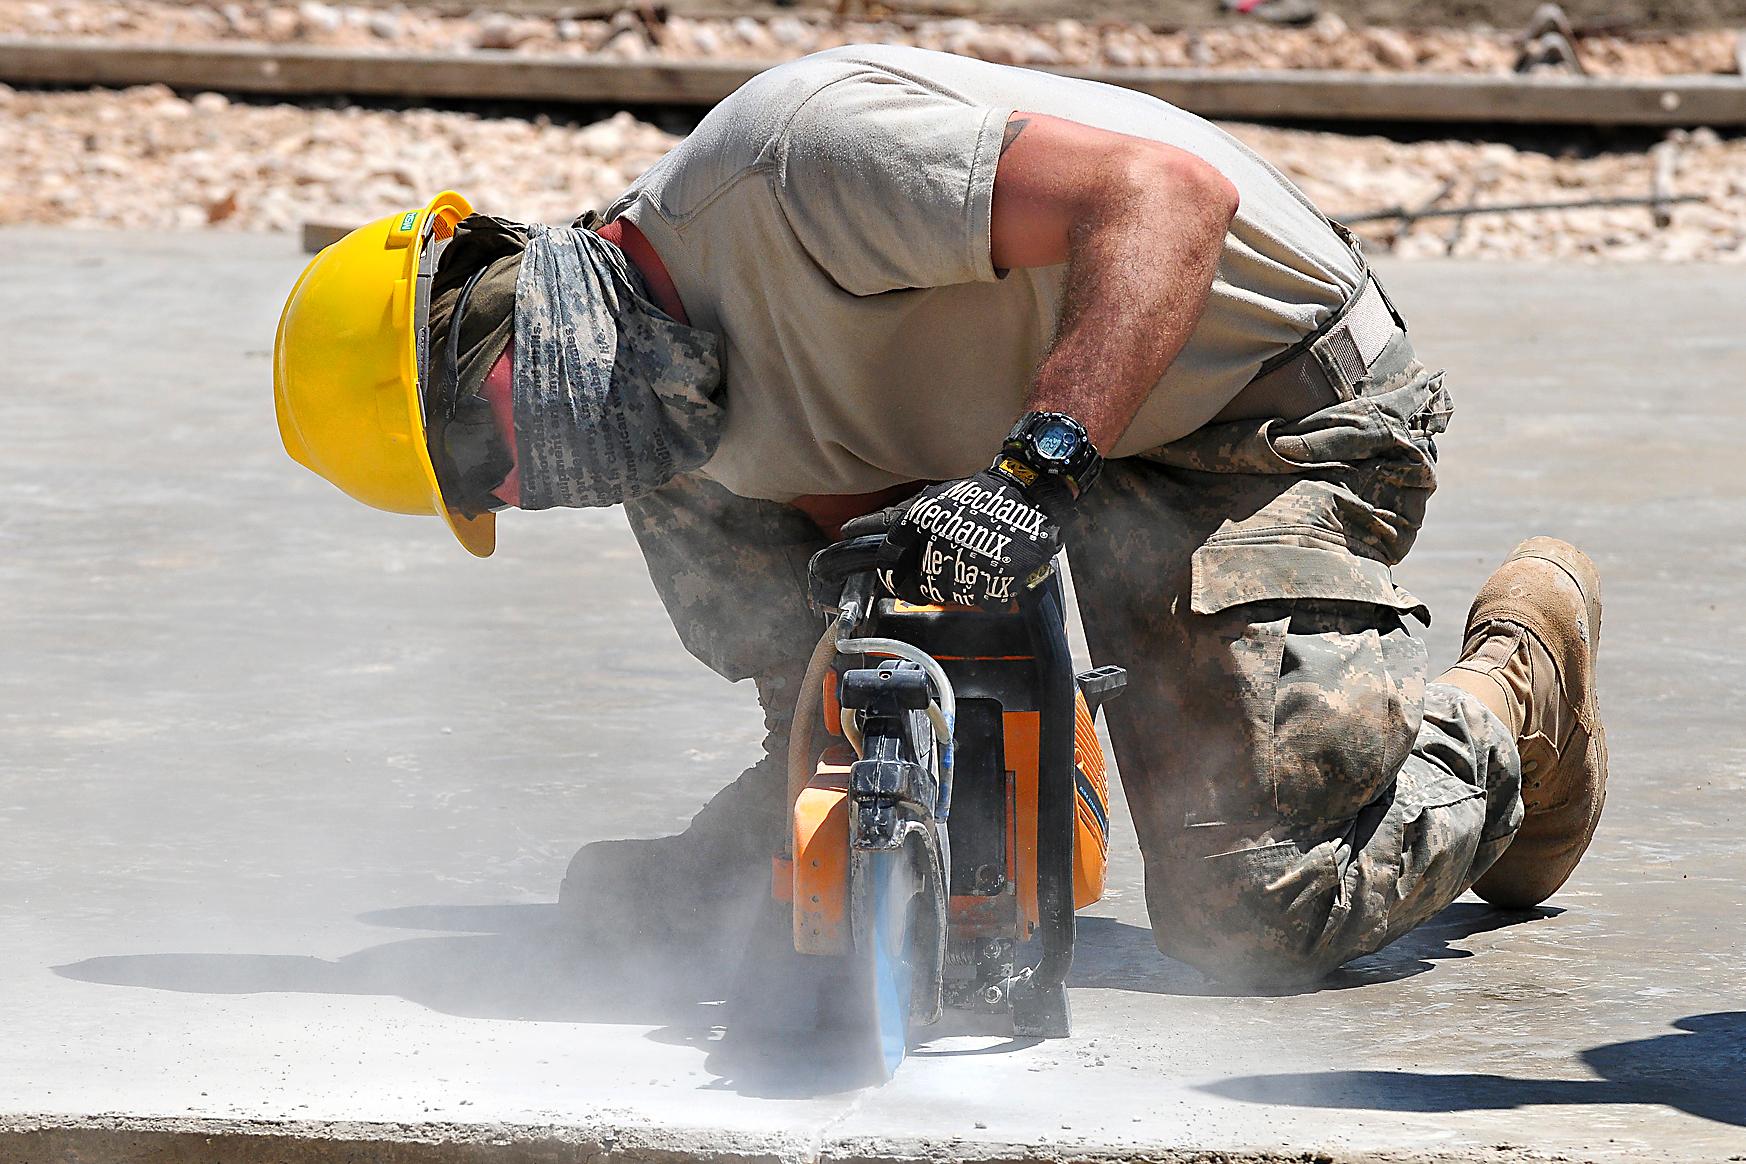 cement contractor